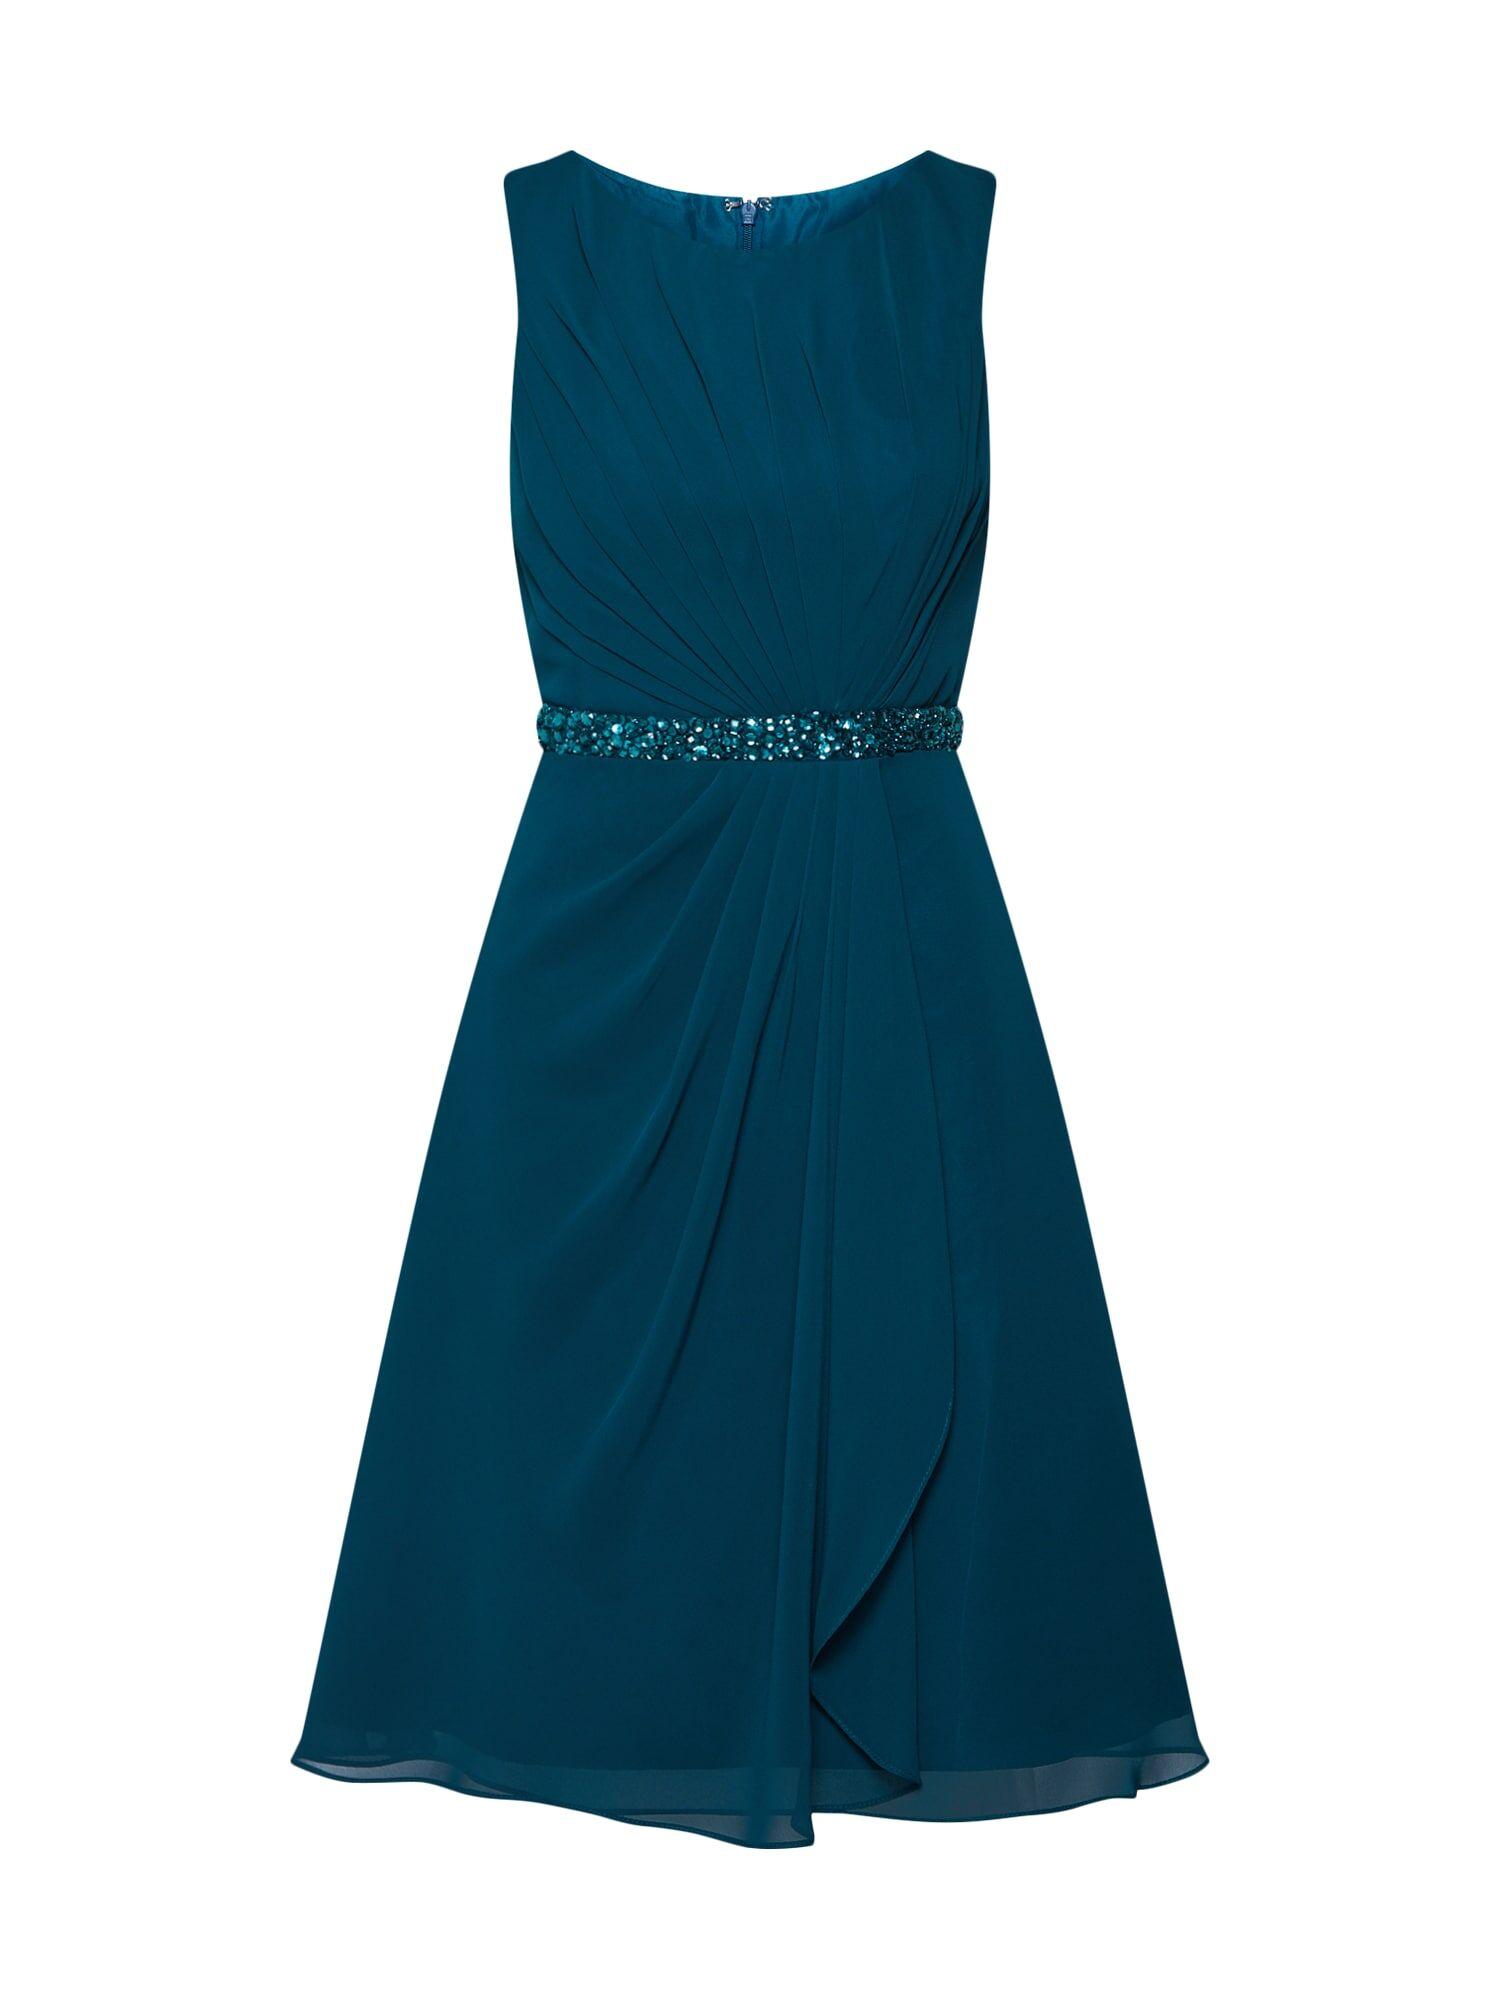 mascara Robe de cocktail 'MC181117'  - Bleu - Taille: 36 - female